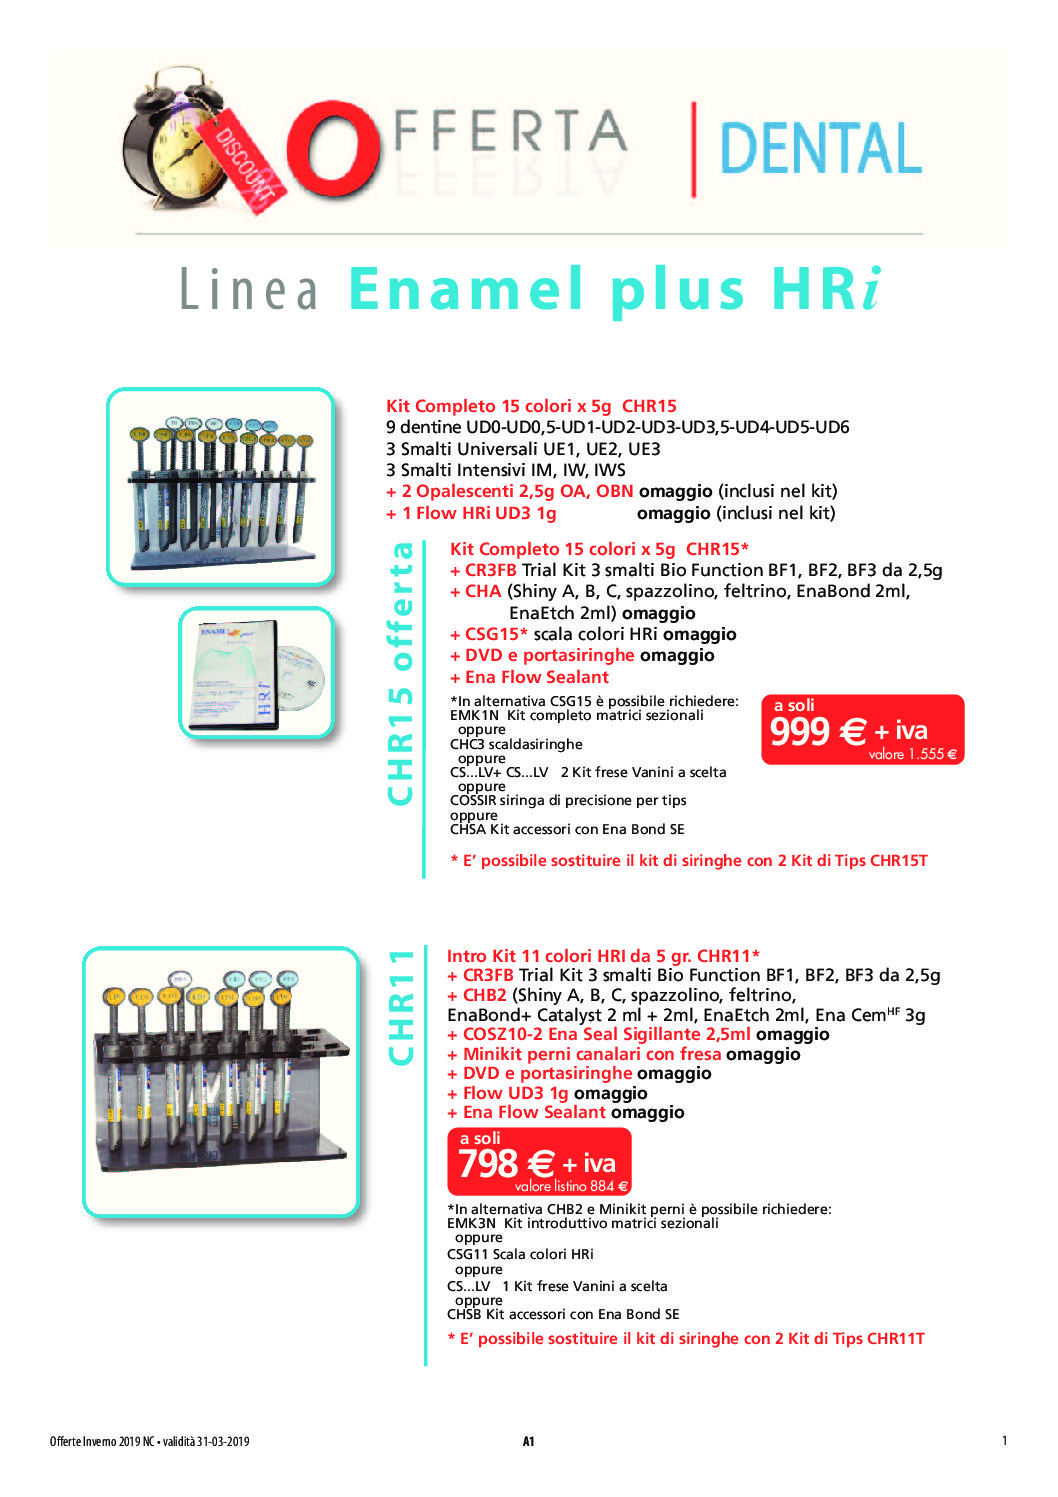 Offerte - Dental-C Materiale odontoiatrico ed odontotecnico